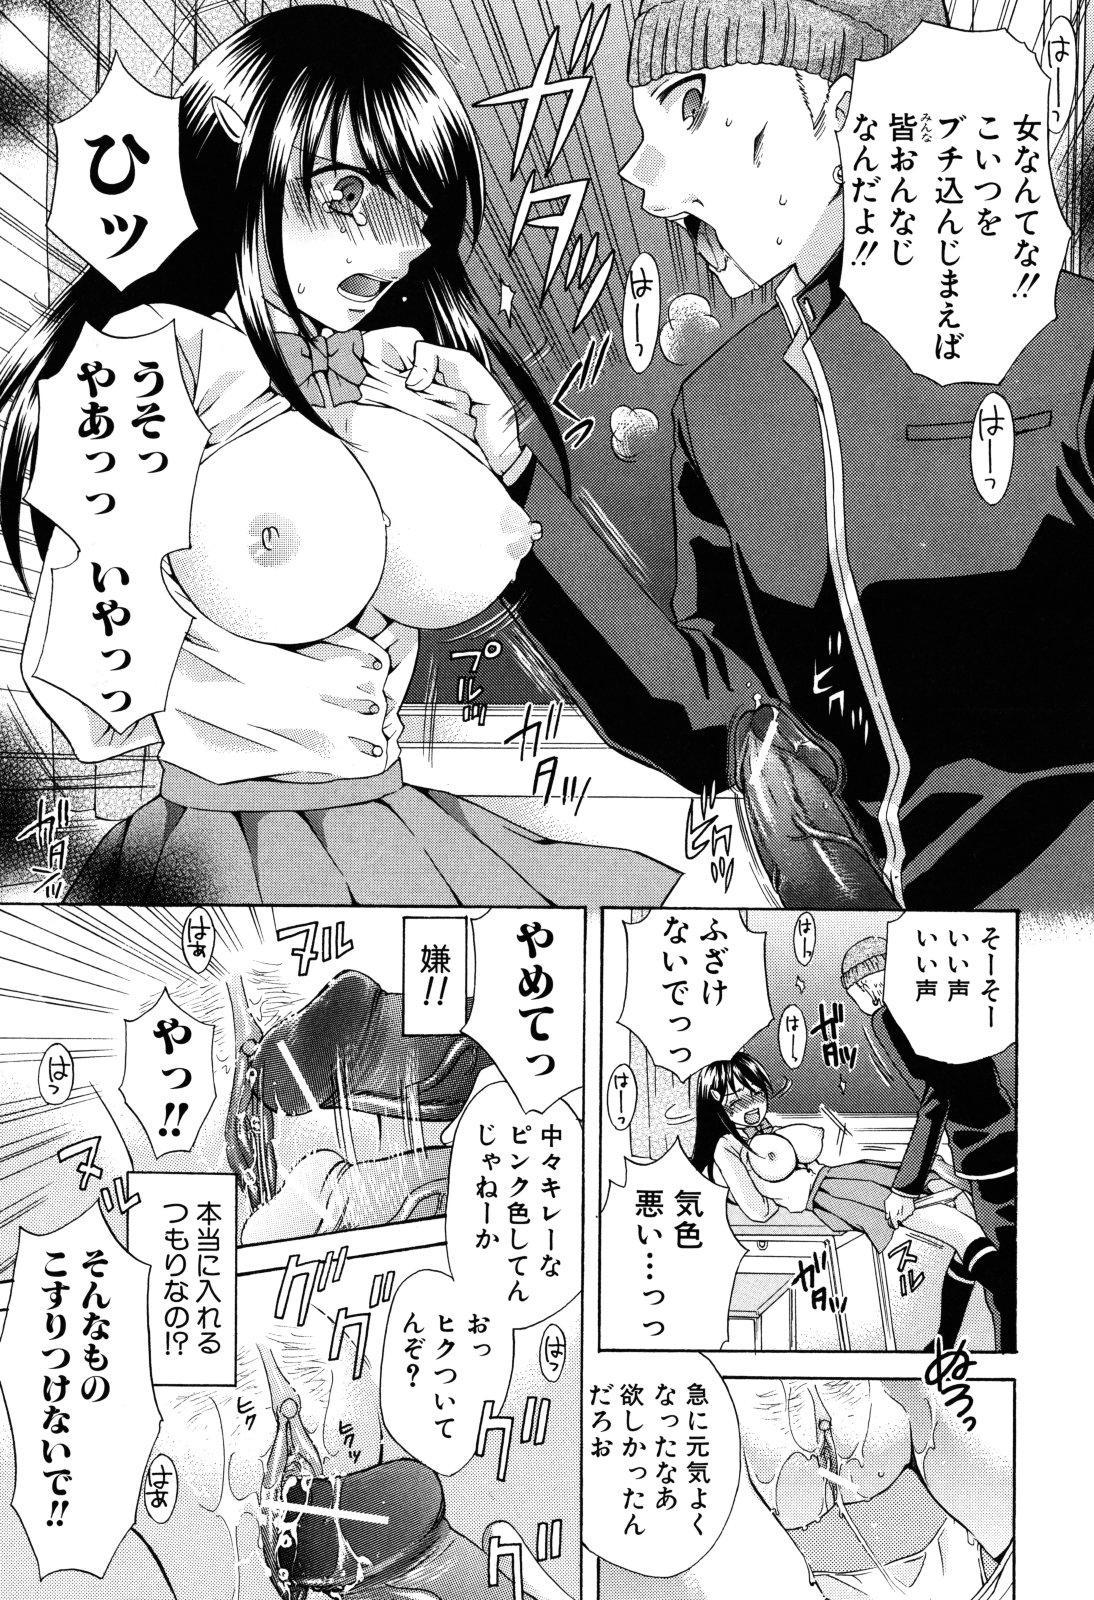 Kanojo ga Ochiru made - She in the depth 154